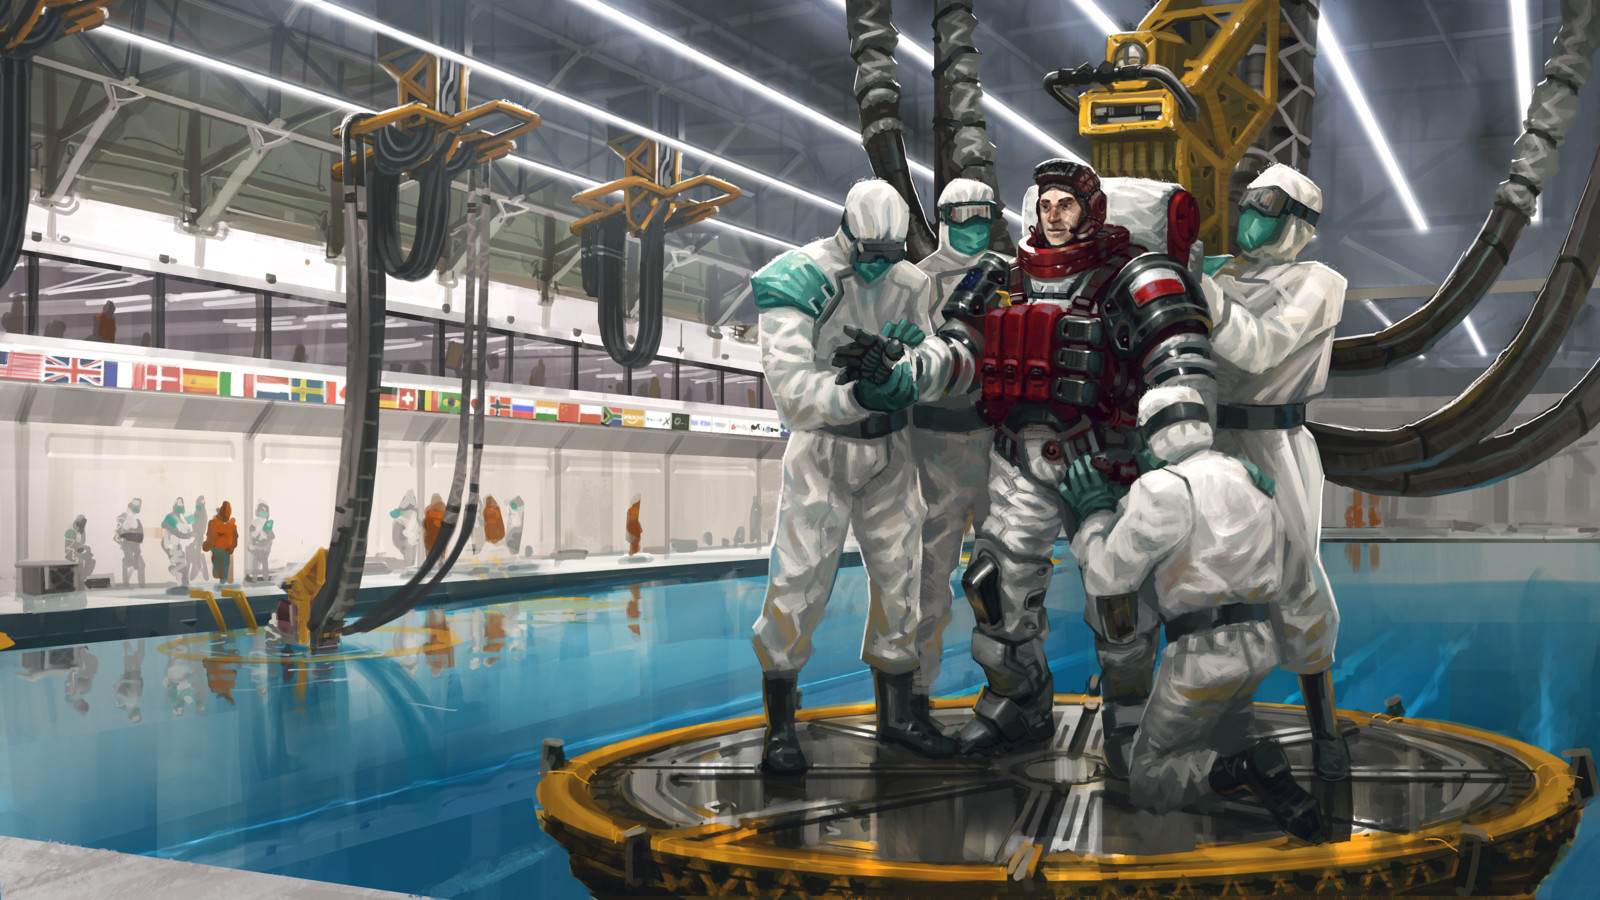 Astronaut Training Session